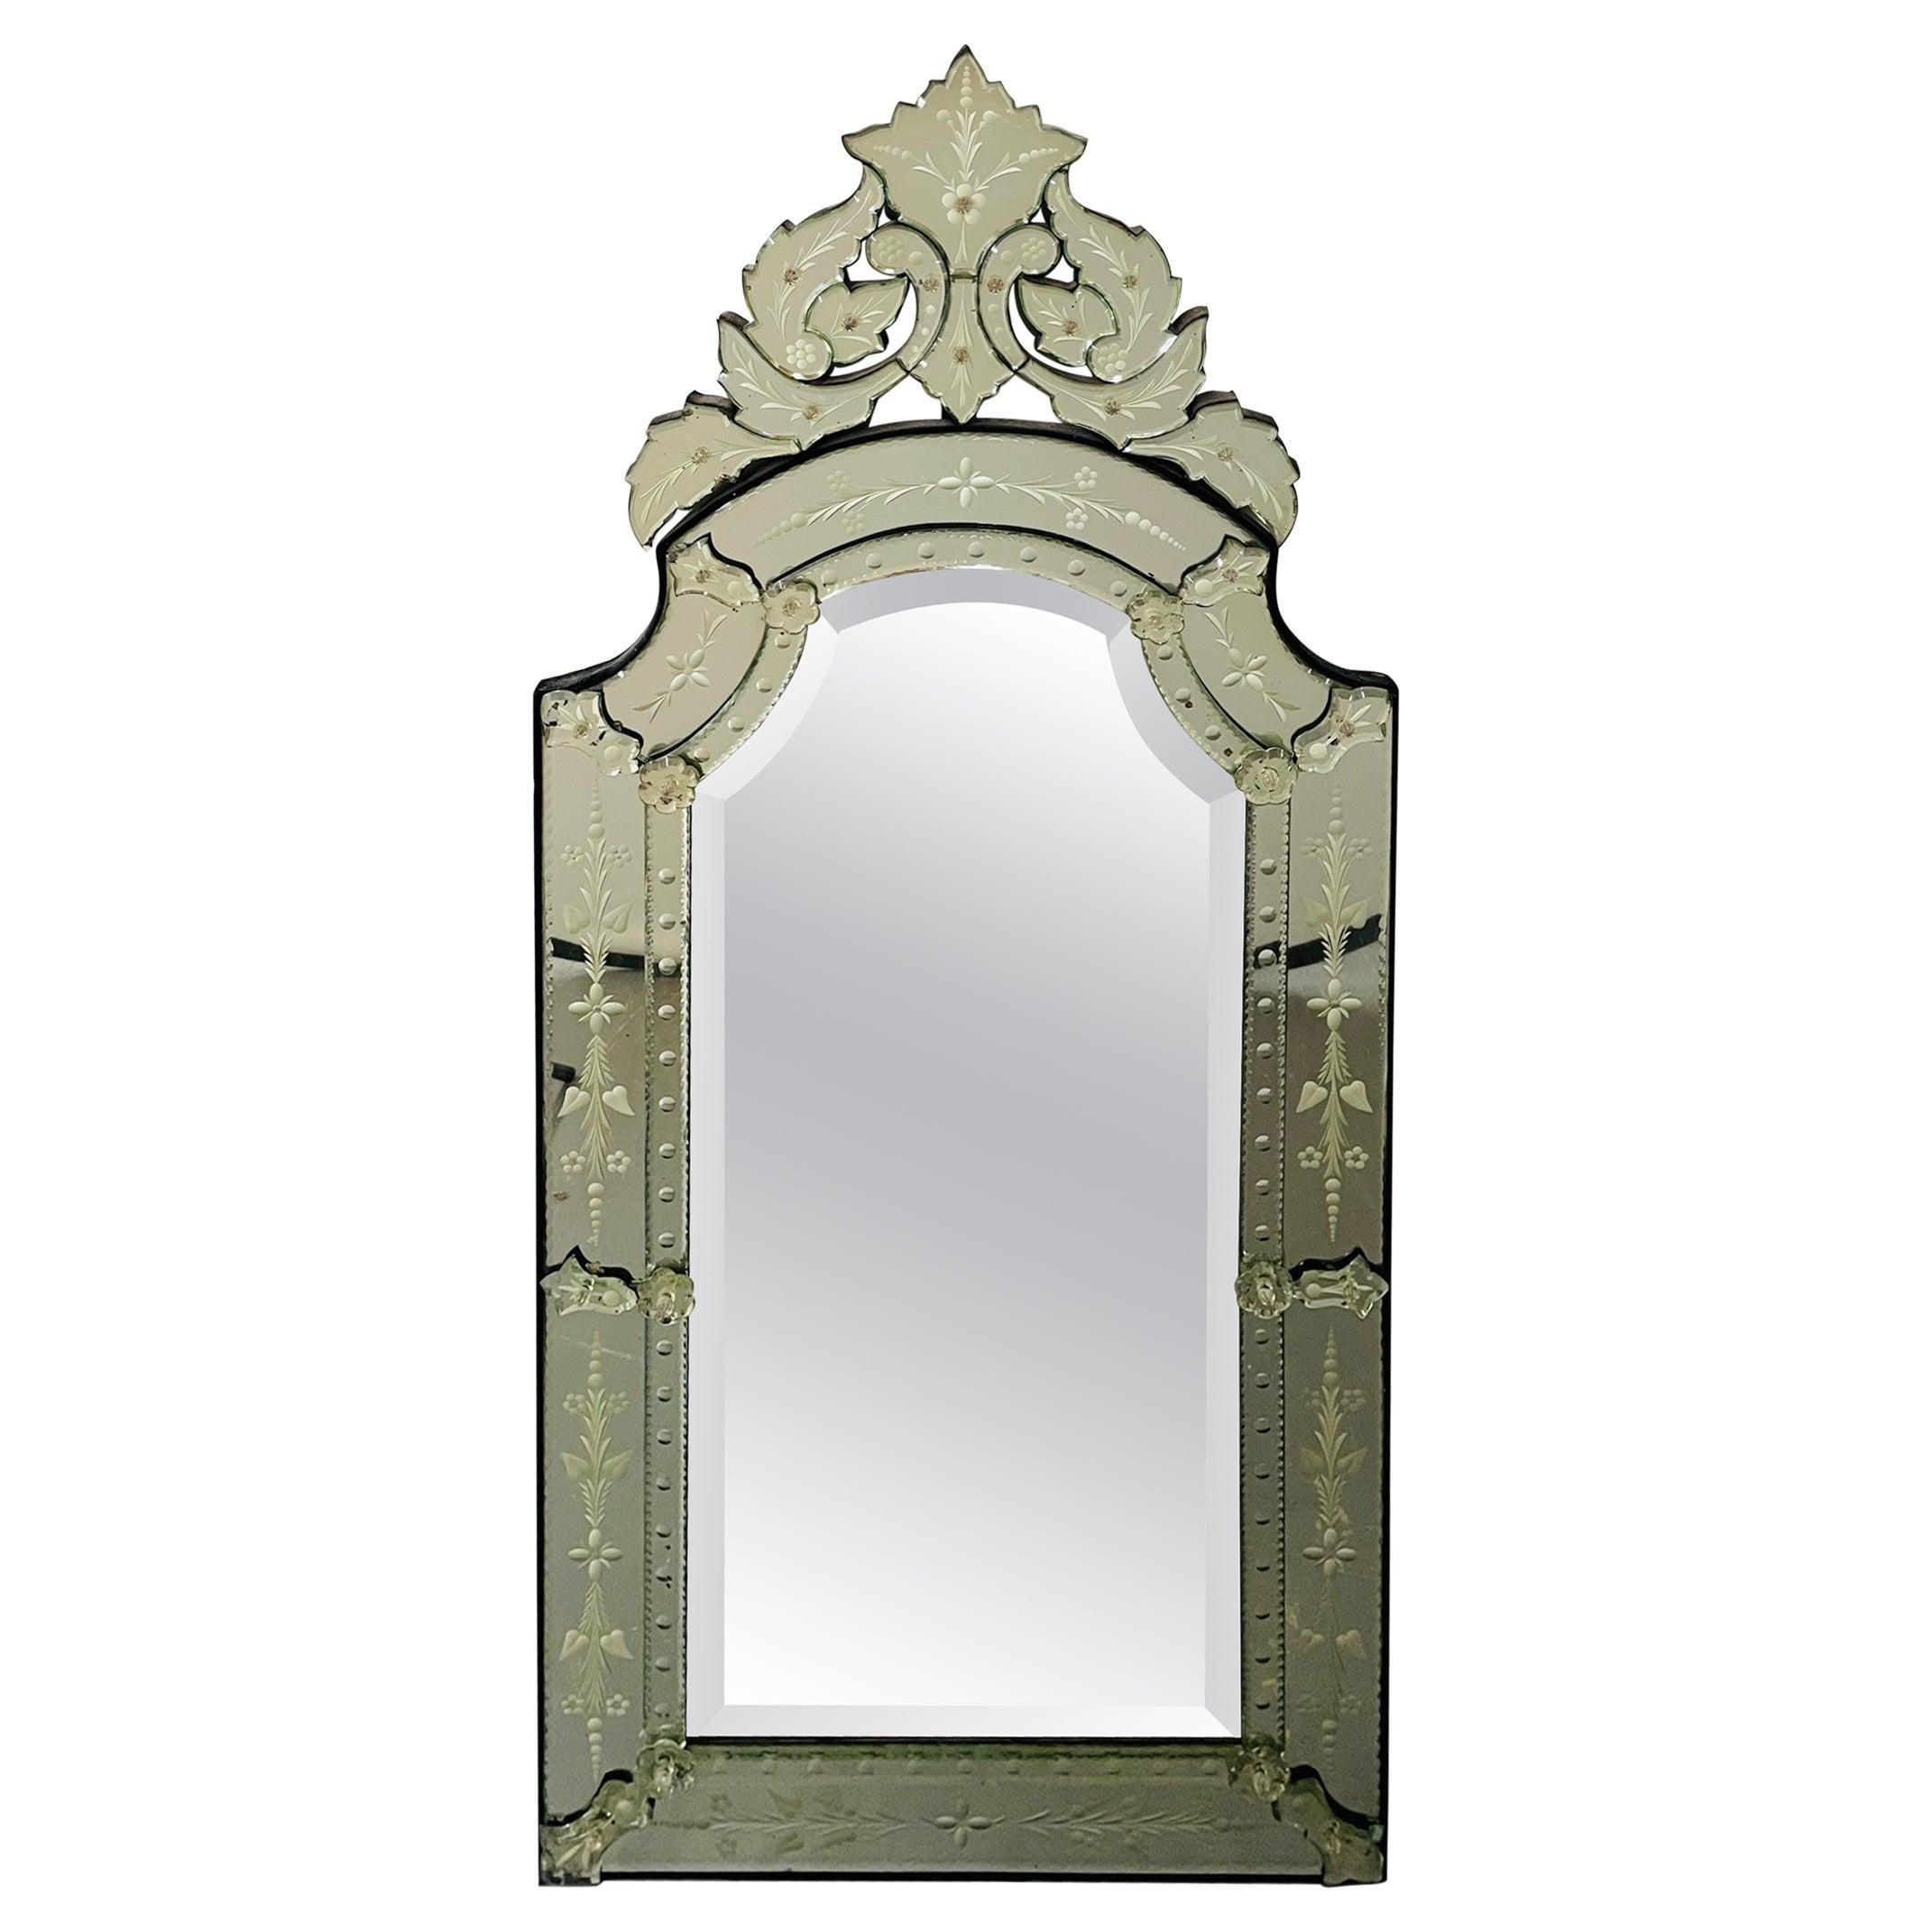 Antique Italian Venetian Etched Glass Mirror